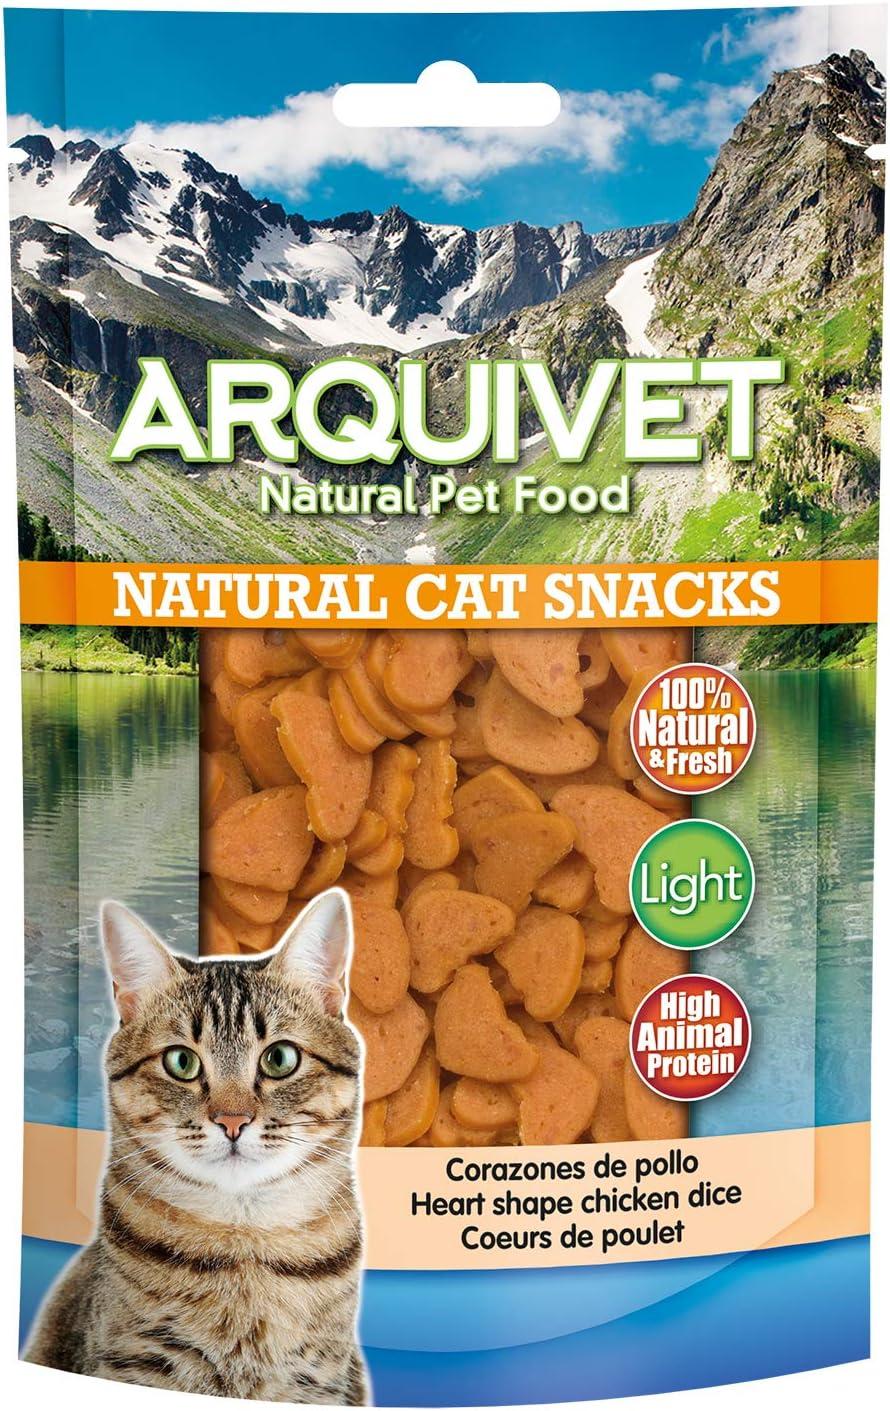 Arquivet Corazones de pollo - Snacks naturales gatos - Natural Cat Snacks 50 g